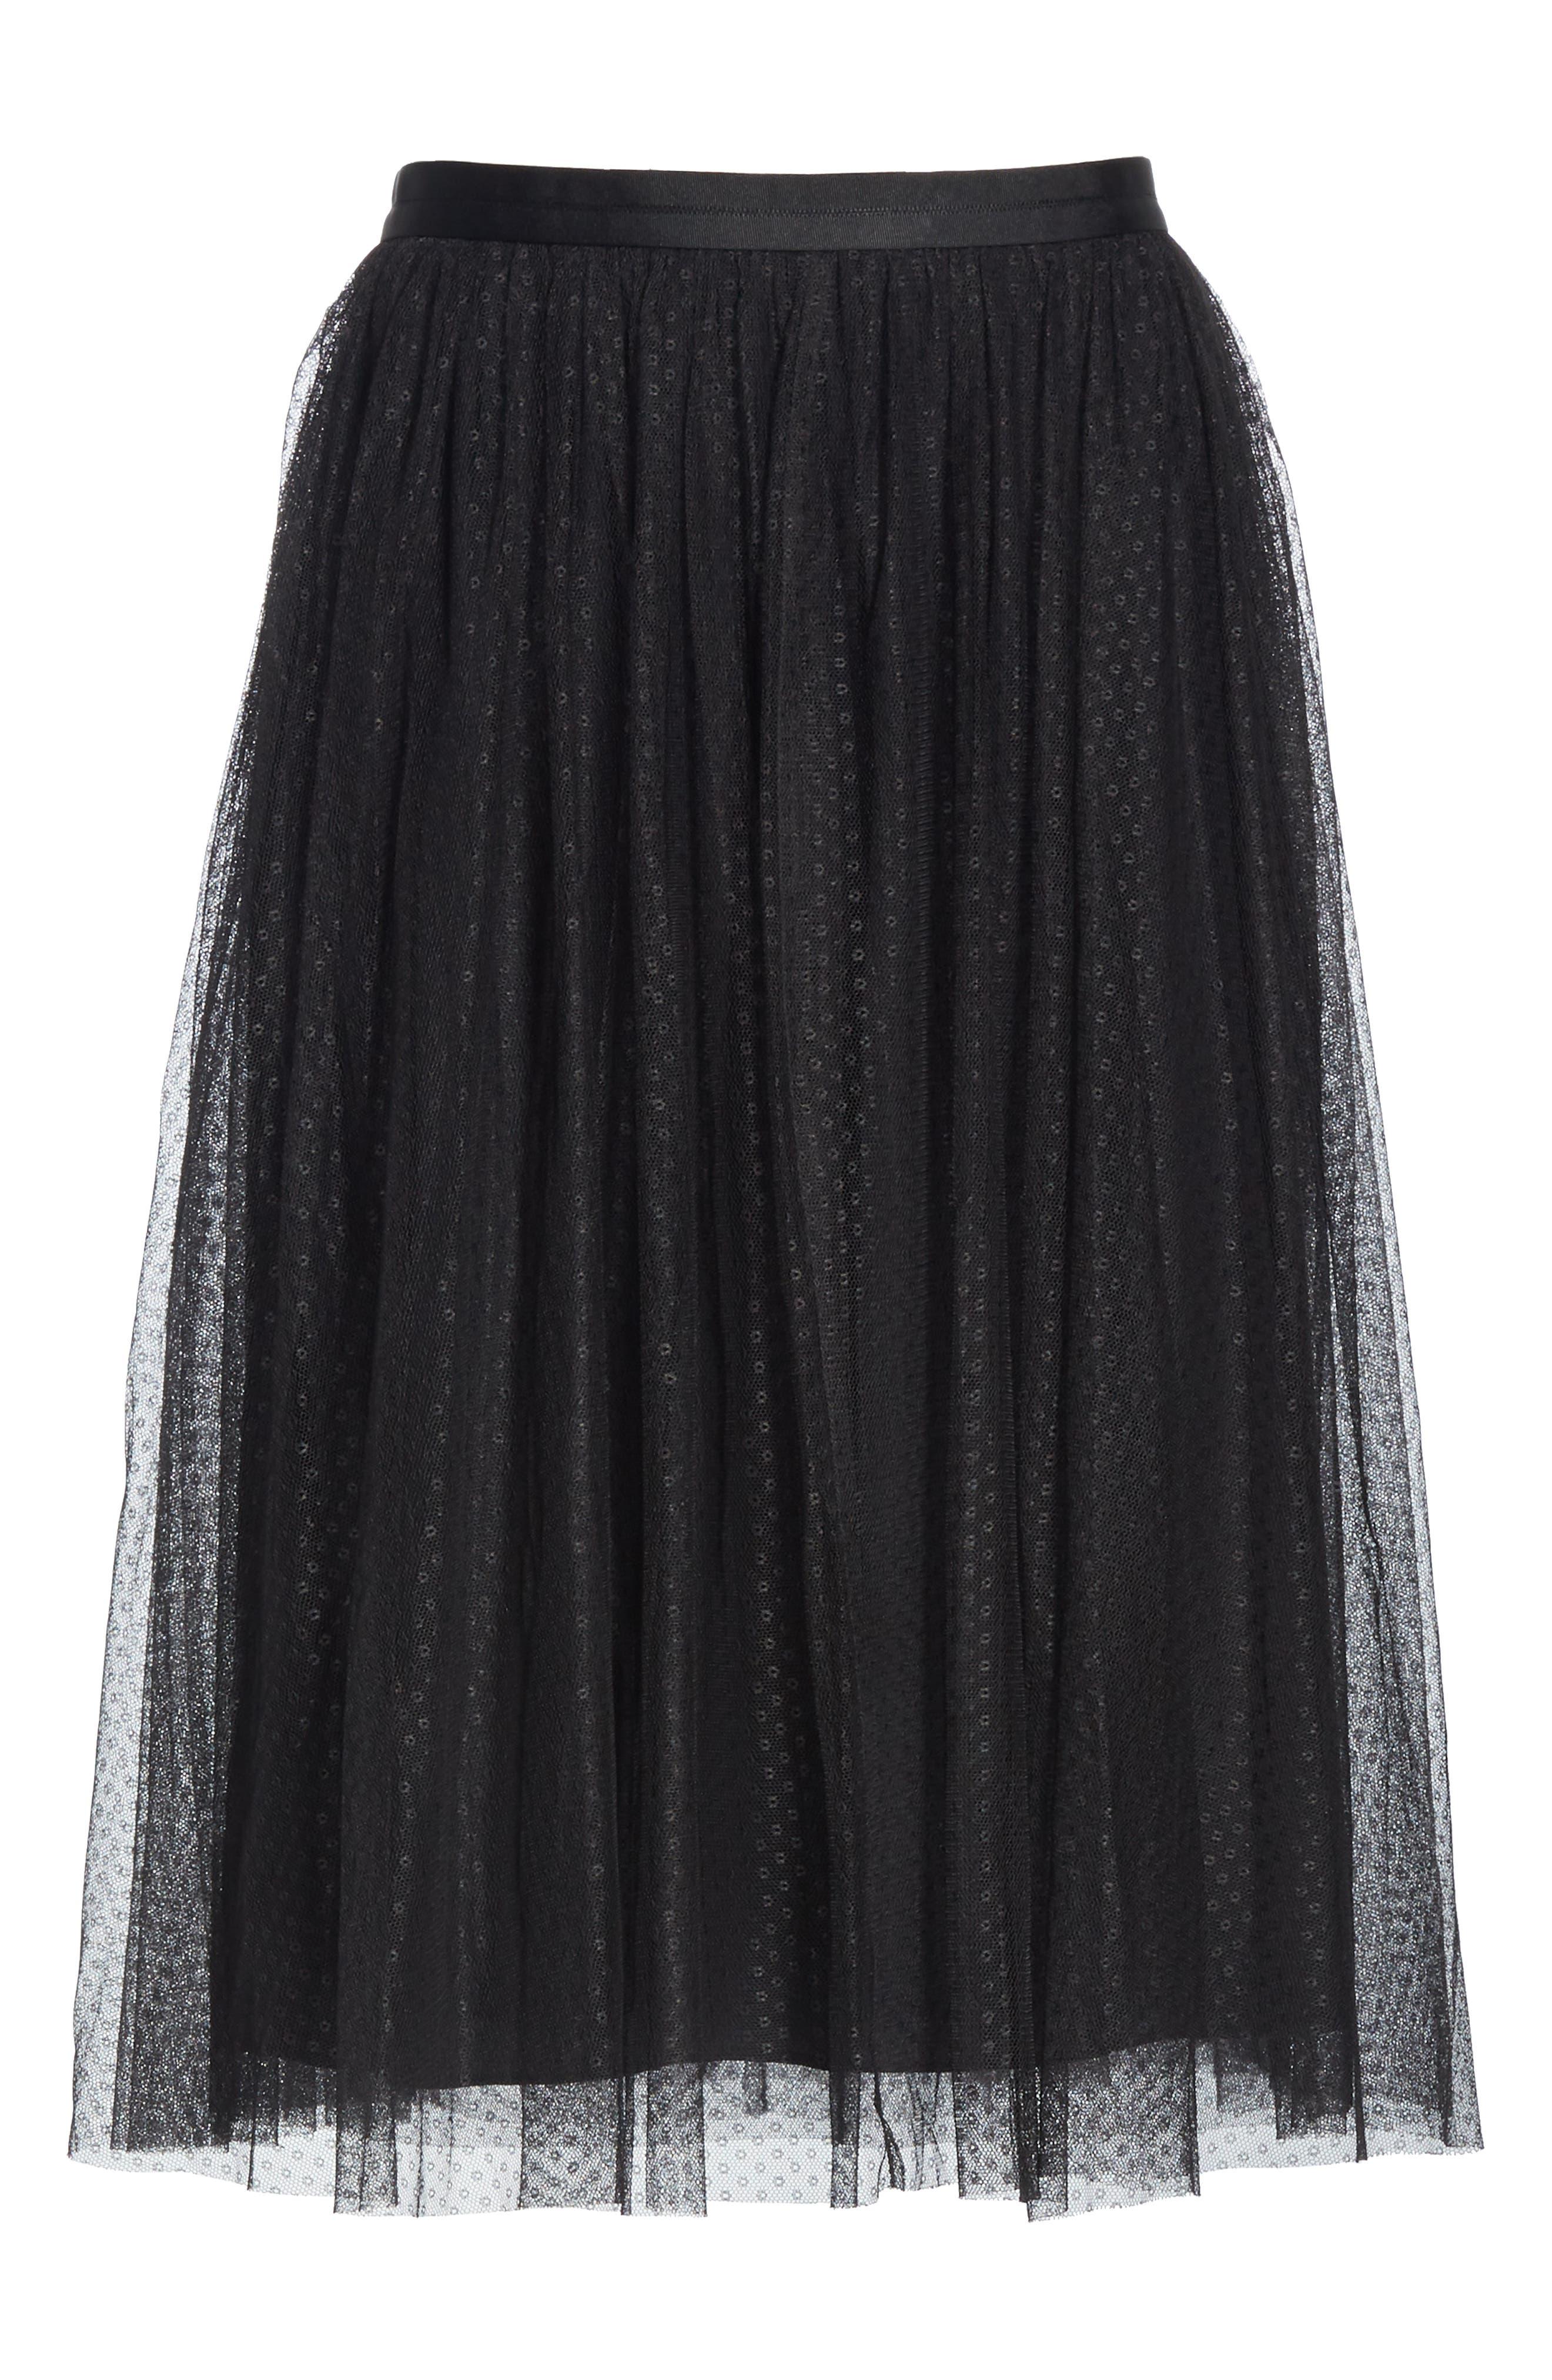 Dotted Tulle Skirt,                             Alternate thumbnail 6, color,                             001